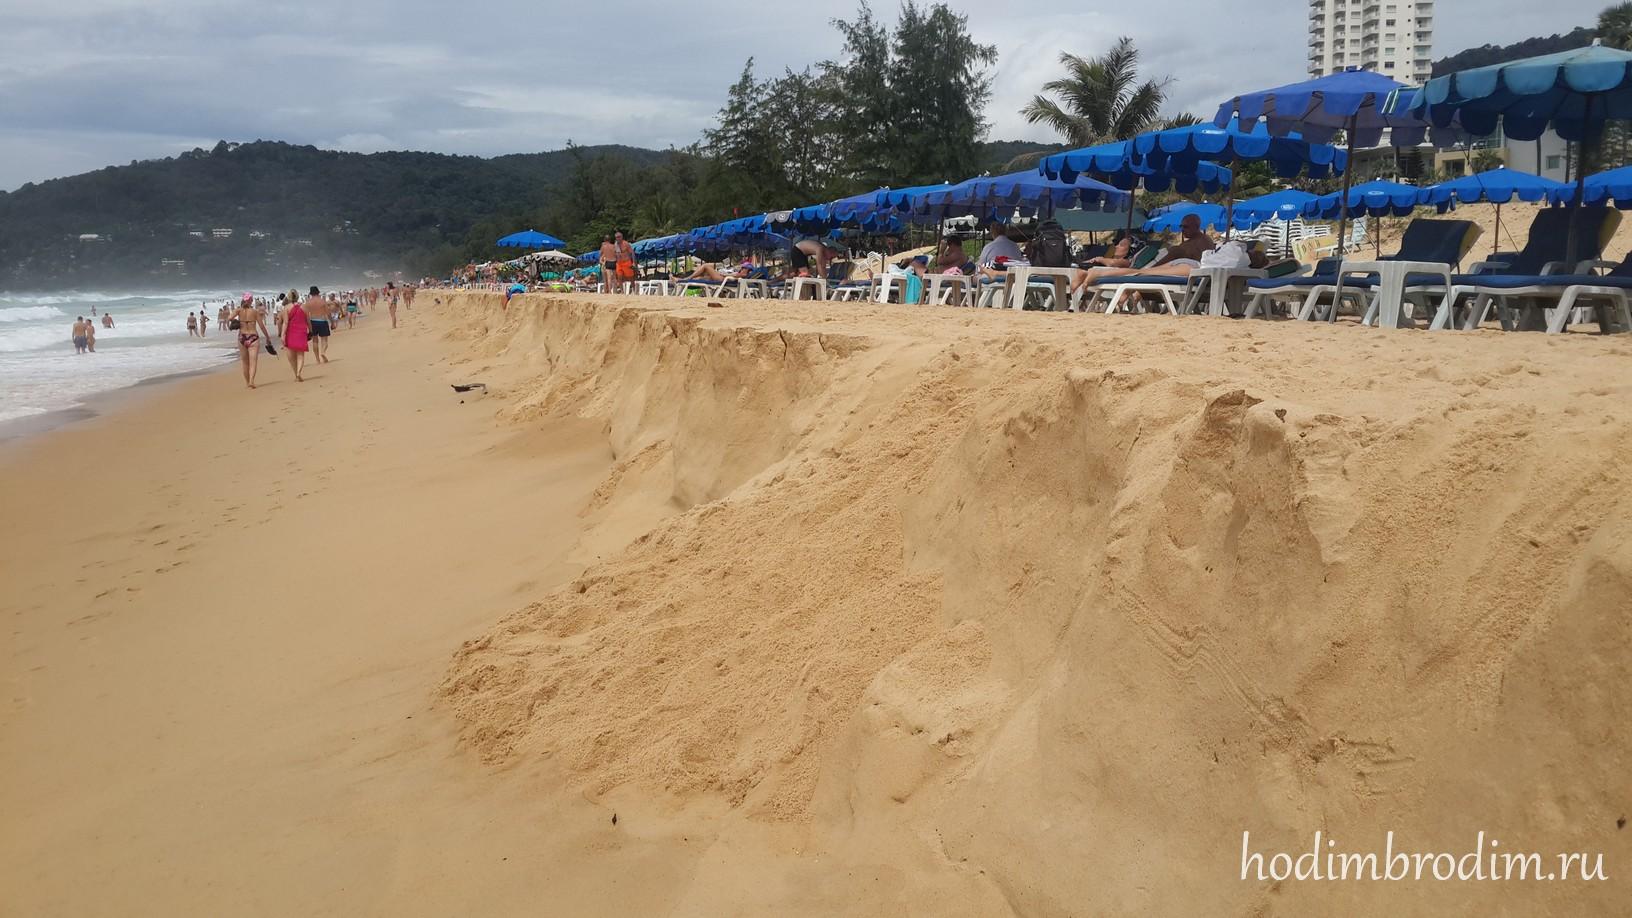 Пляж карон 2018 фото